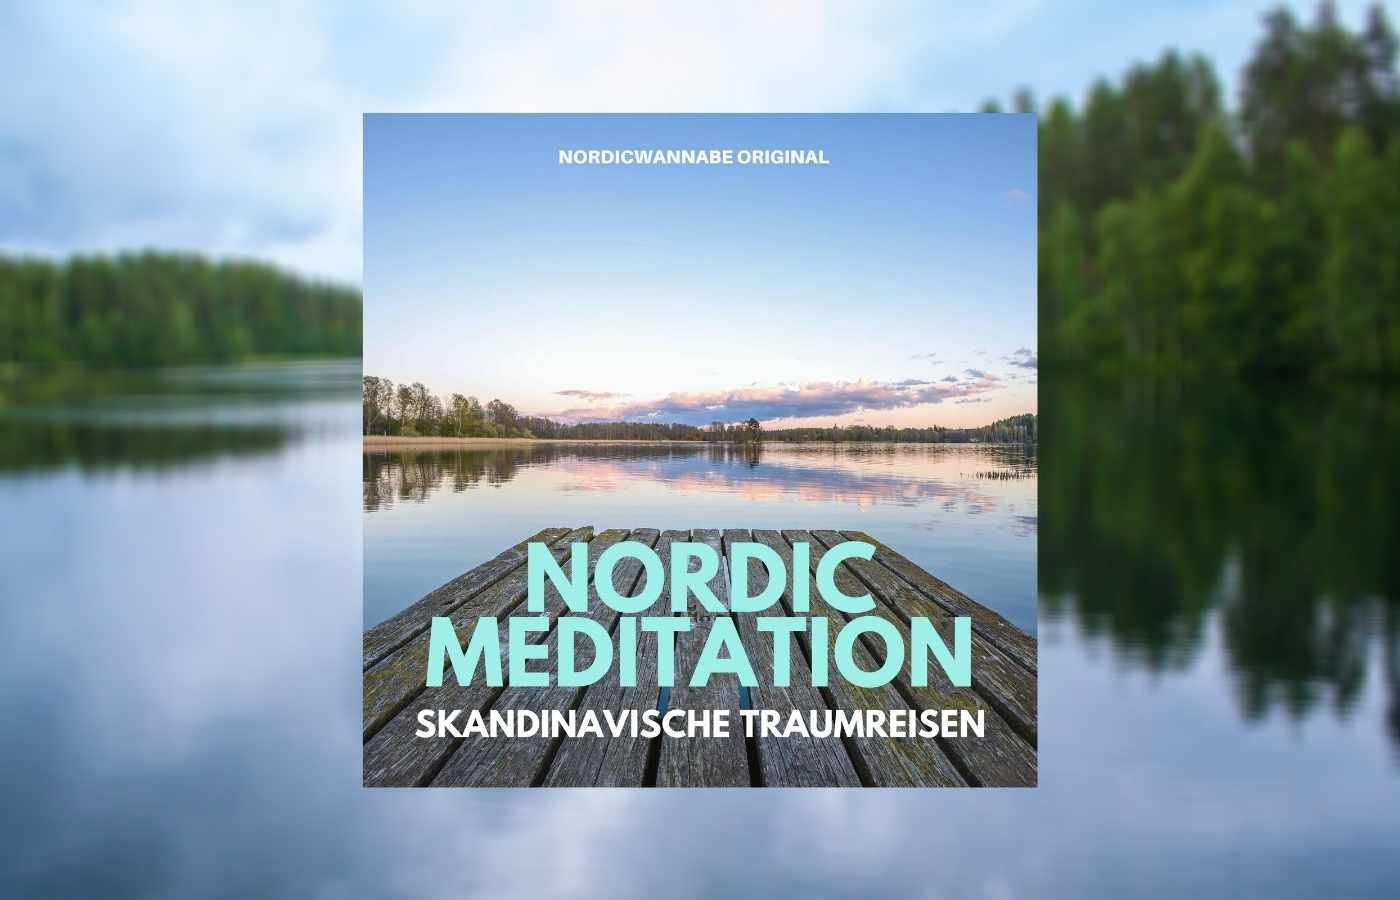 Nordic Meditation, Meditationspodcast 2020, neuer Podcast, Traumreisen